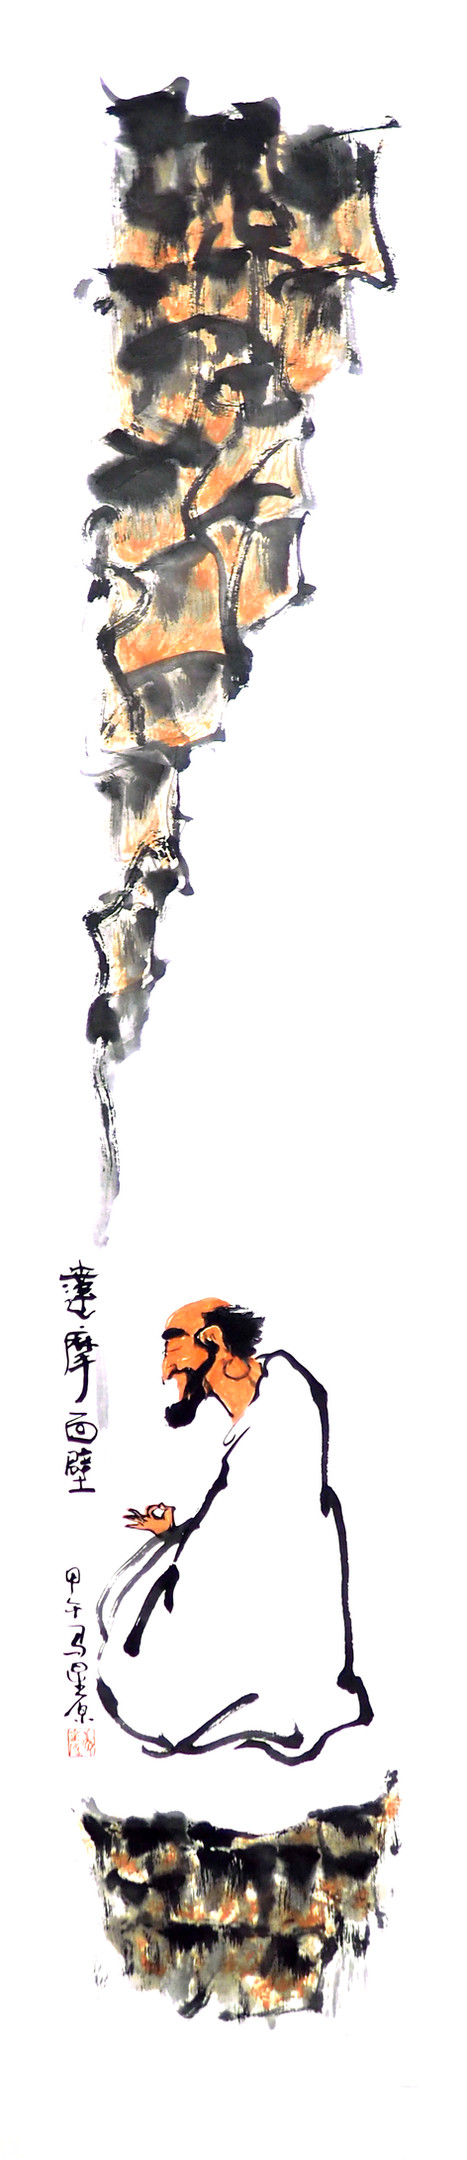 馬星原 Malone Yuen